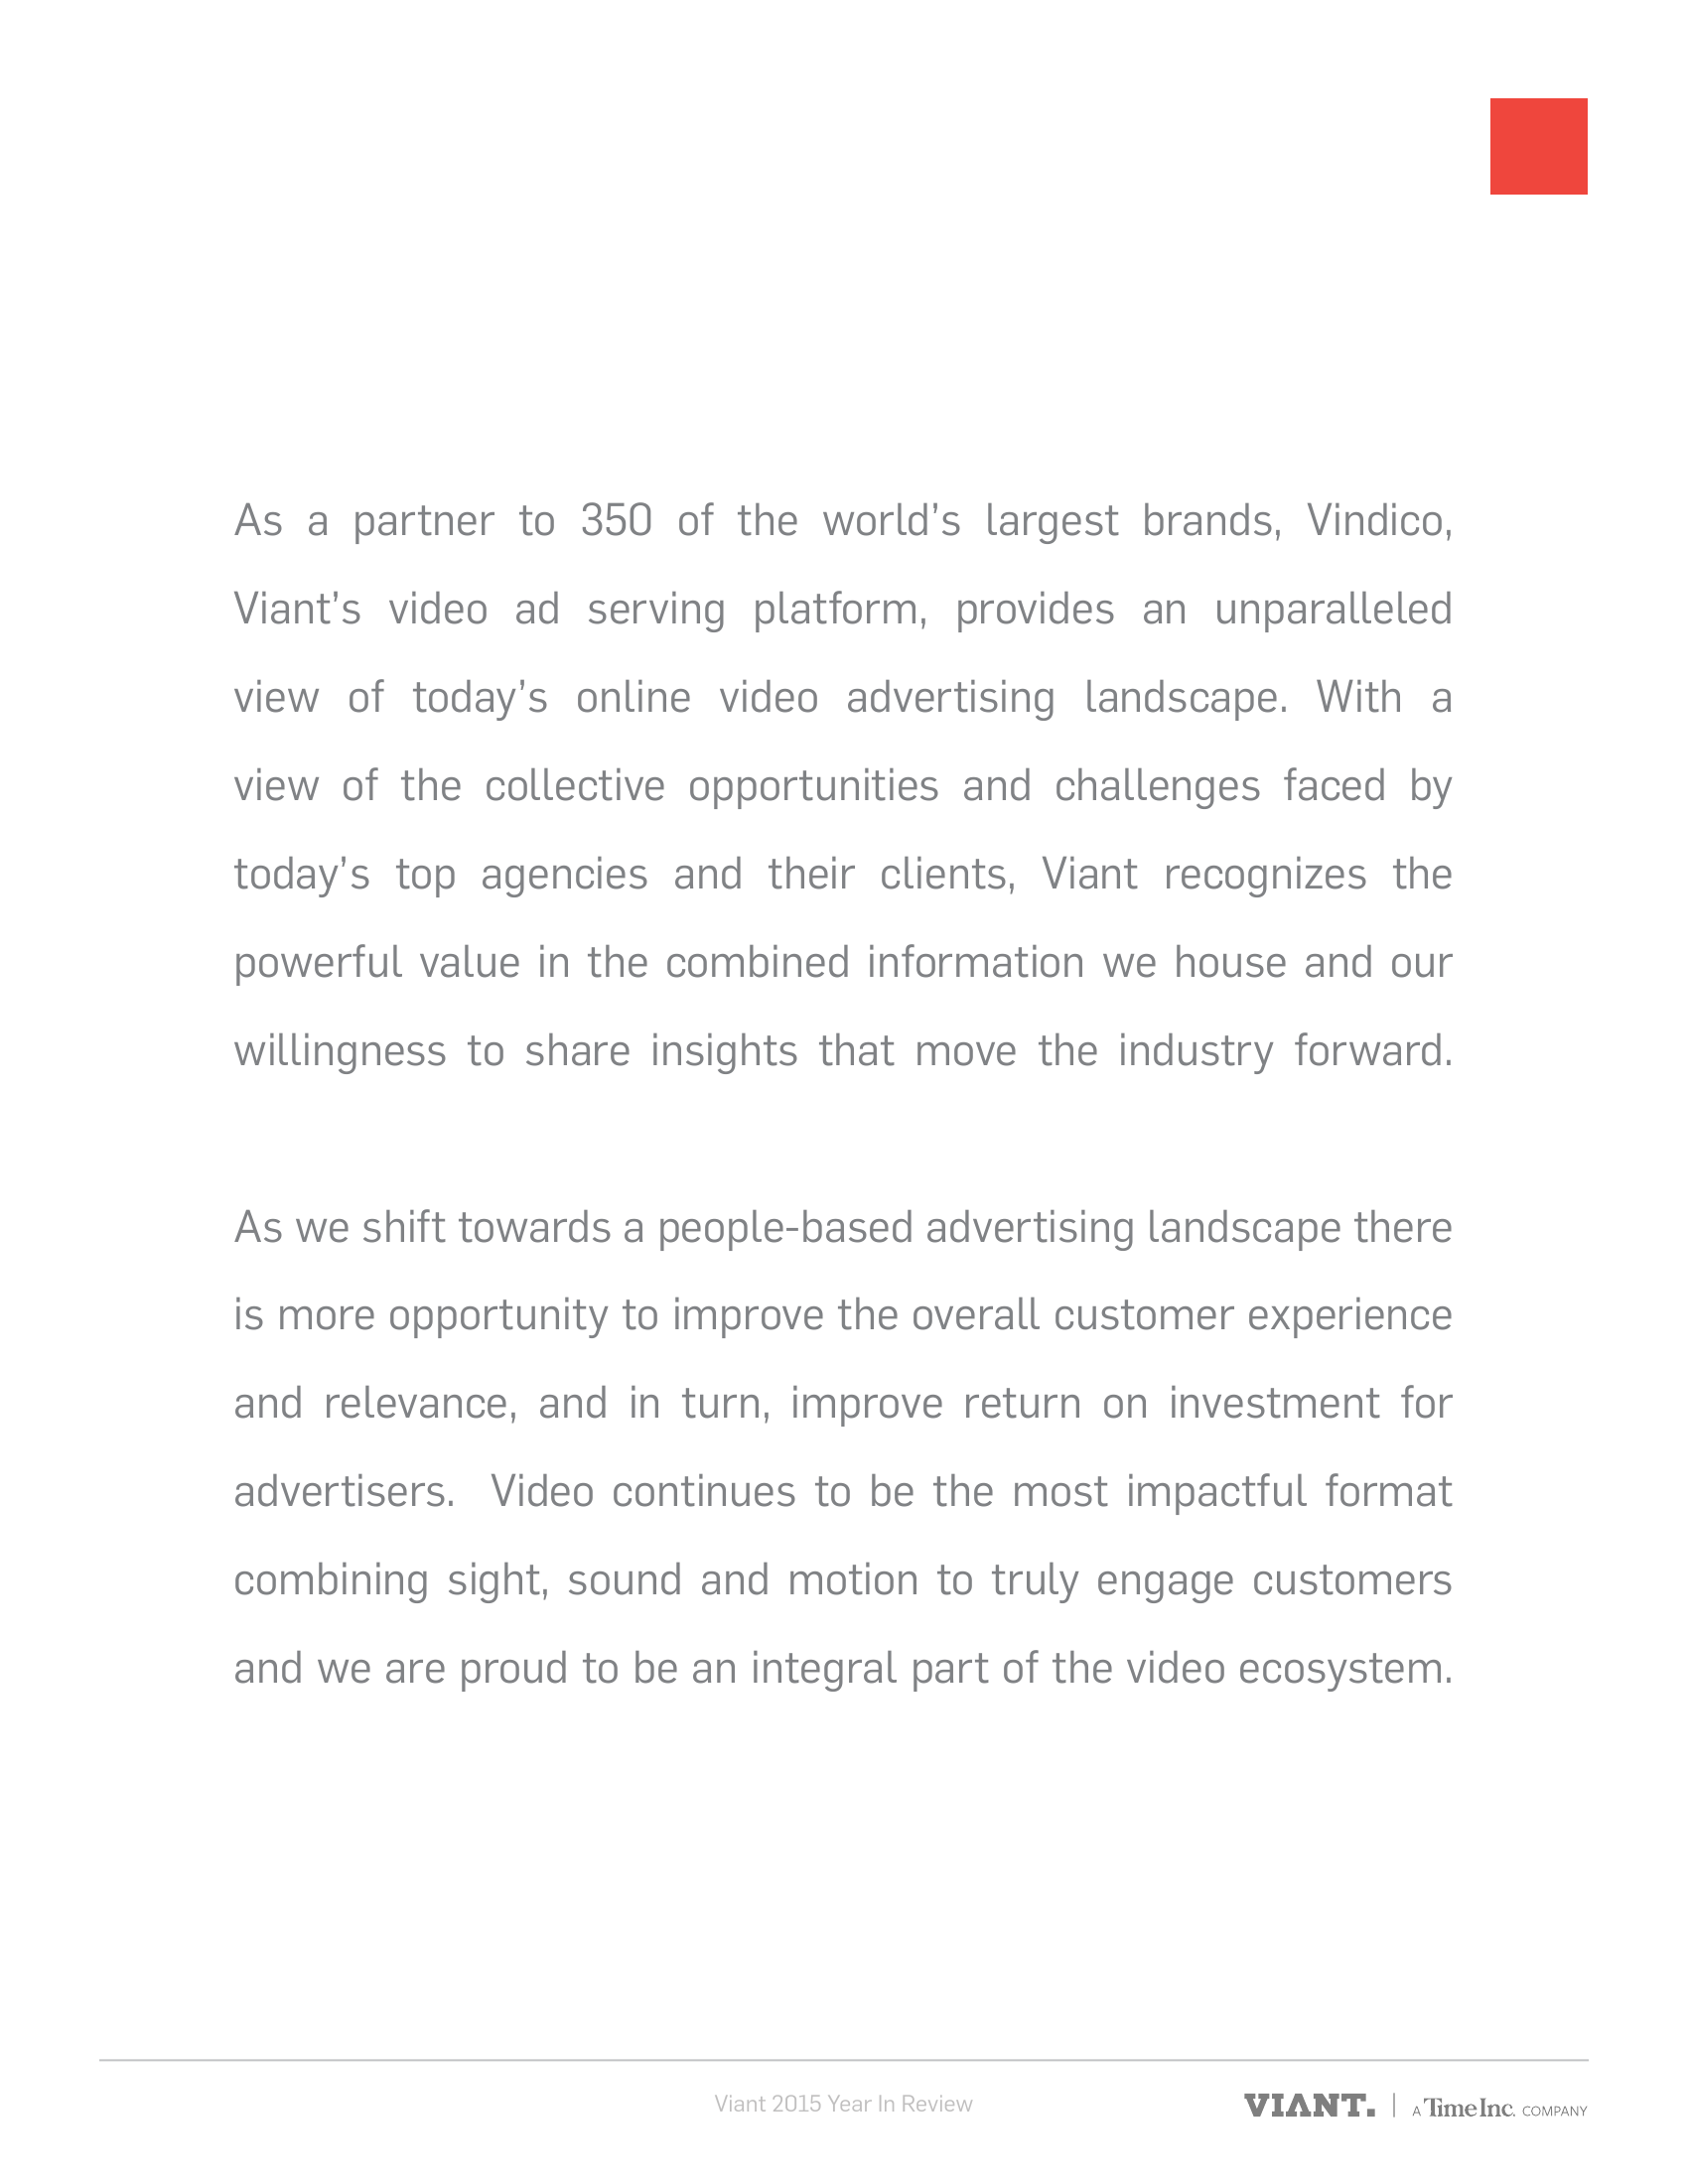 Viant:2015年视频广告趋势分析报告_000002